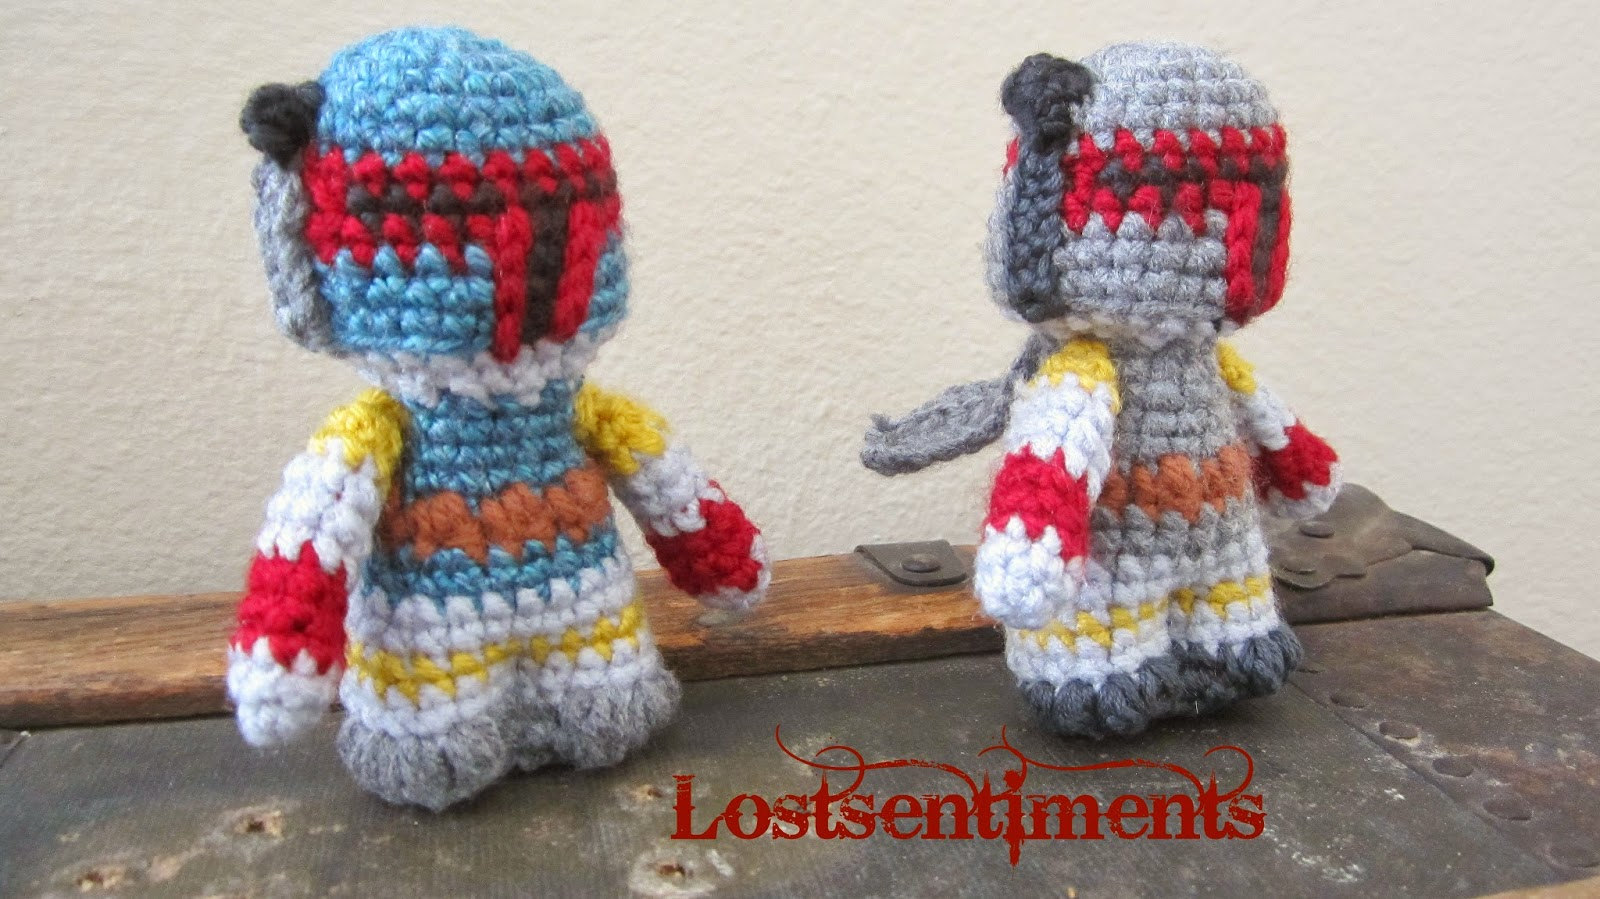 Amigurumi Free Pattern Dinosaur : lostsentiments: Blueba & Boba Fett - Star Wars Amigurumi